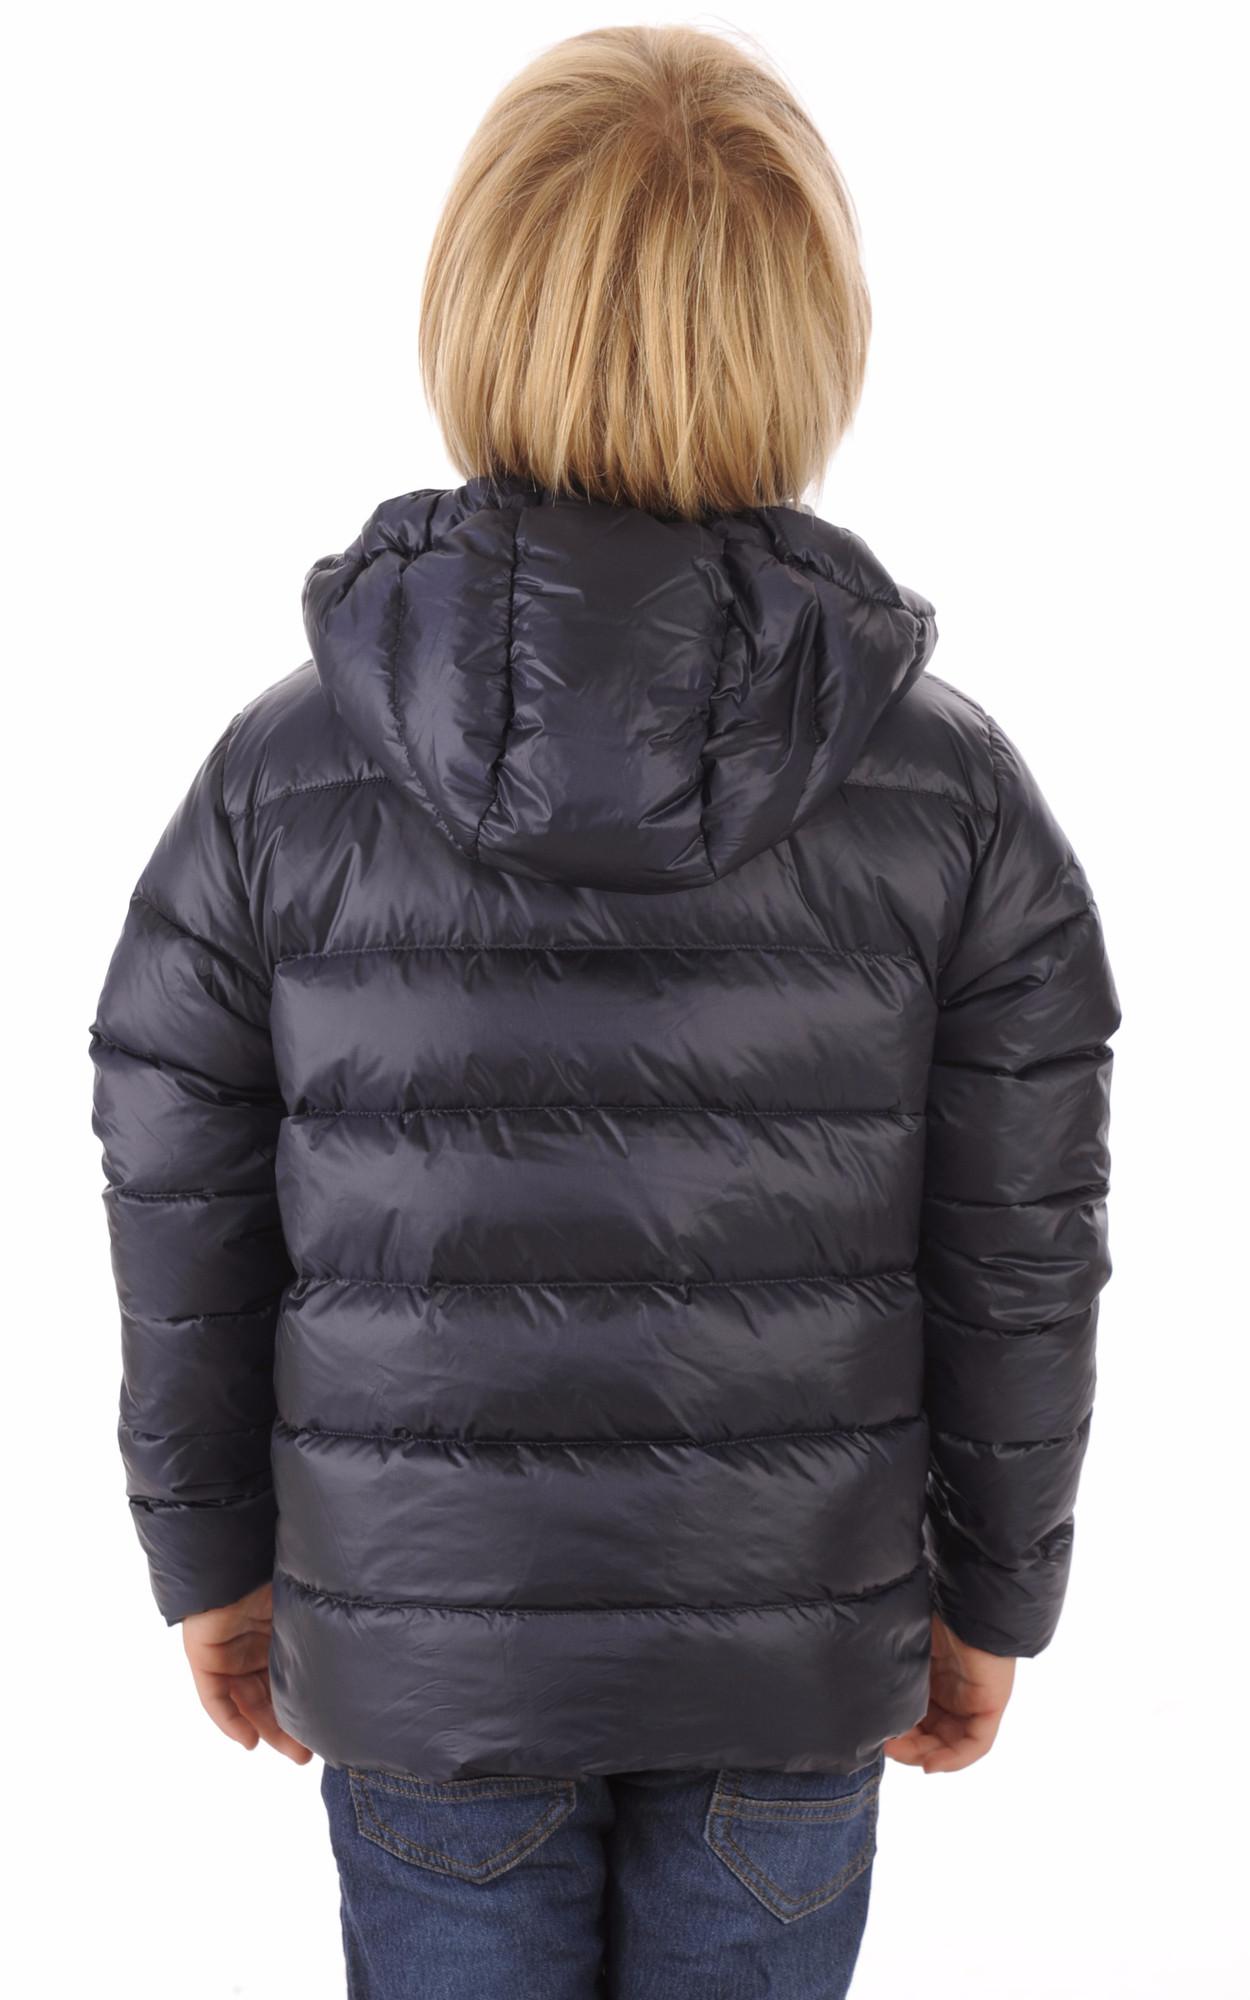 Doudoune Spoutnic Jacket Mat Boy Bleu